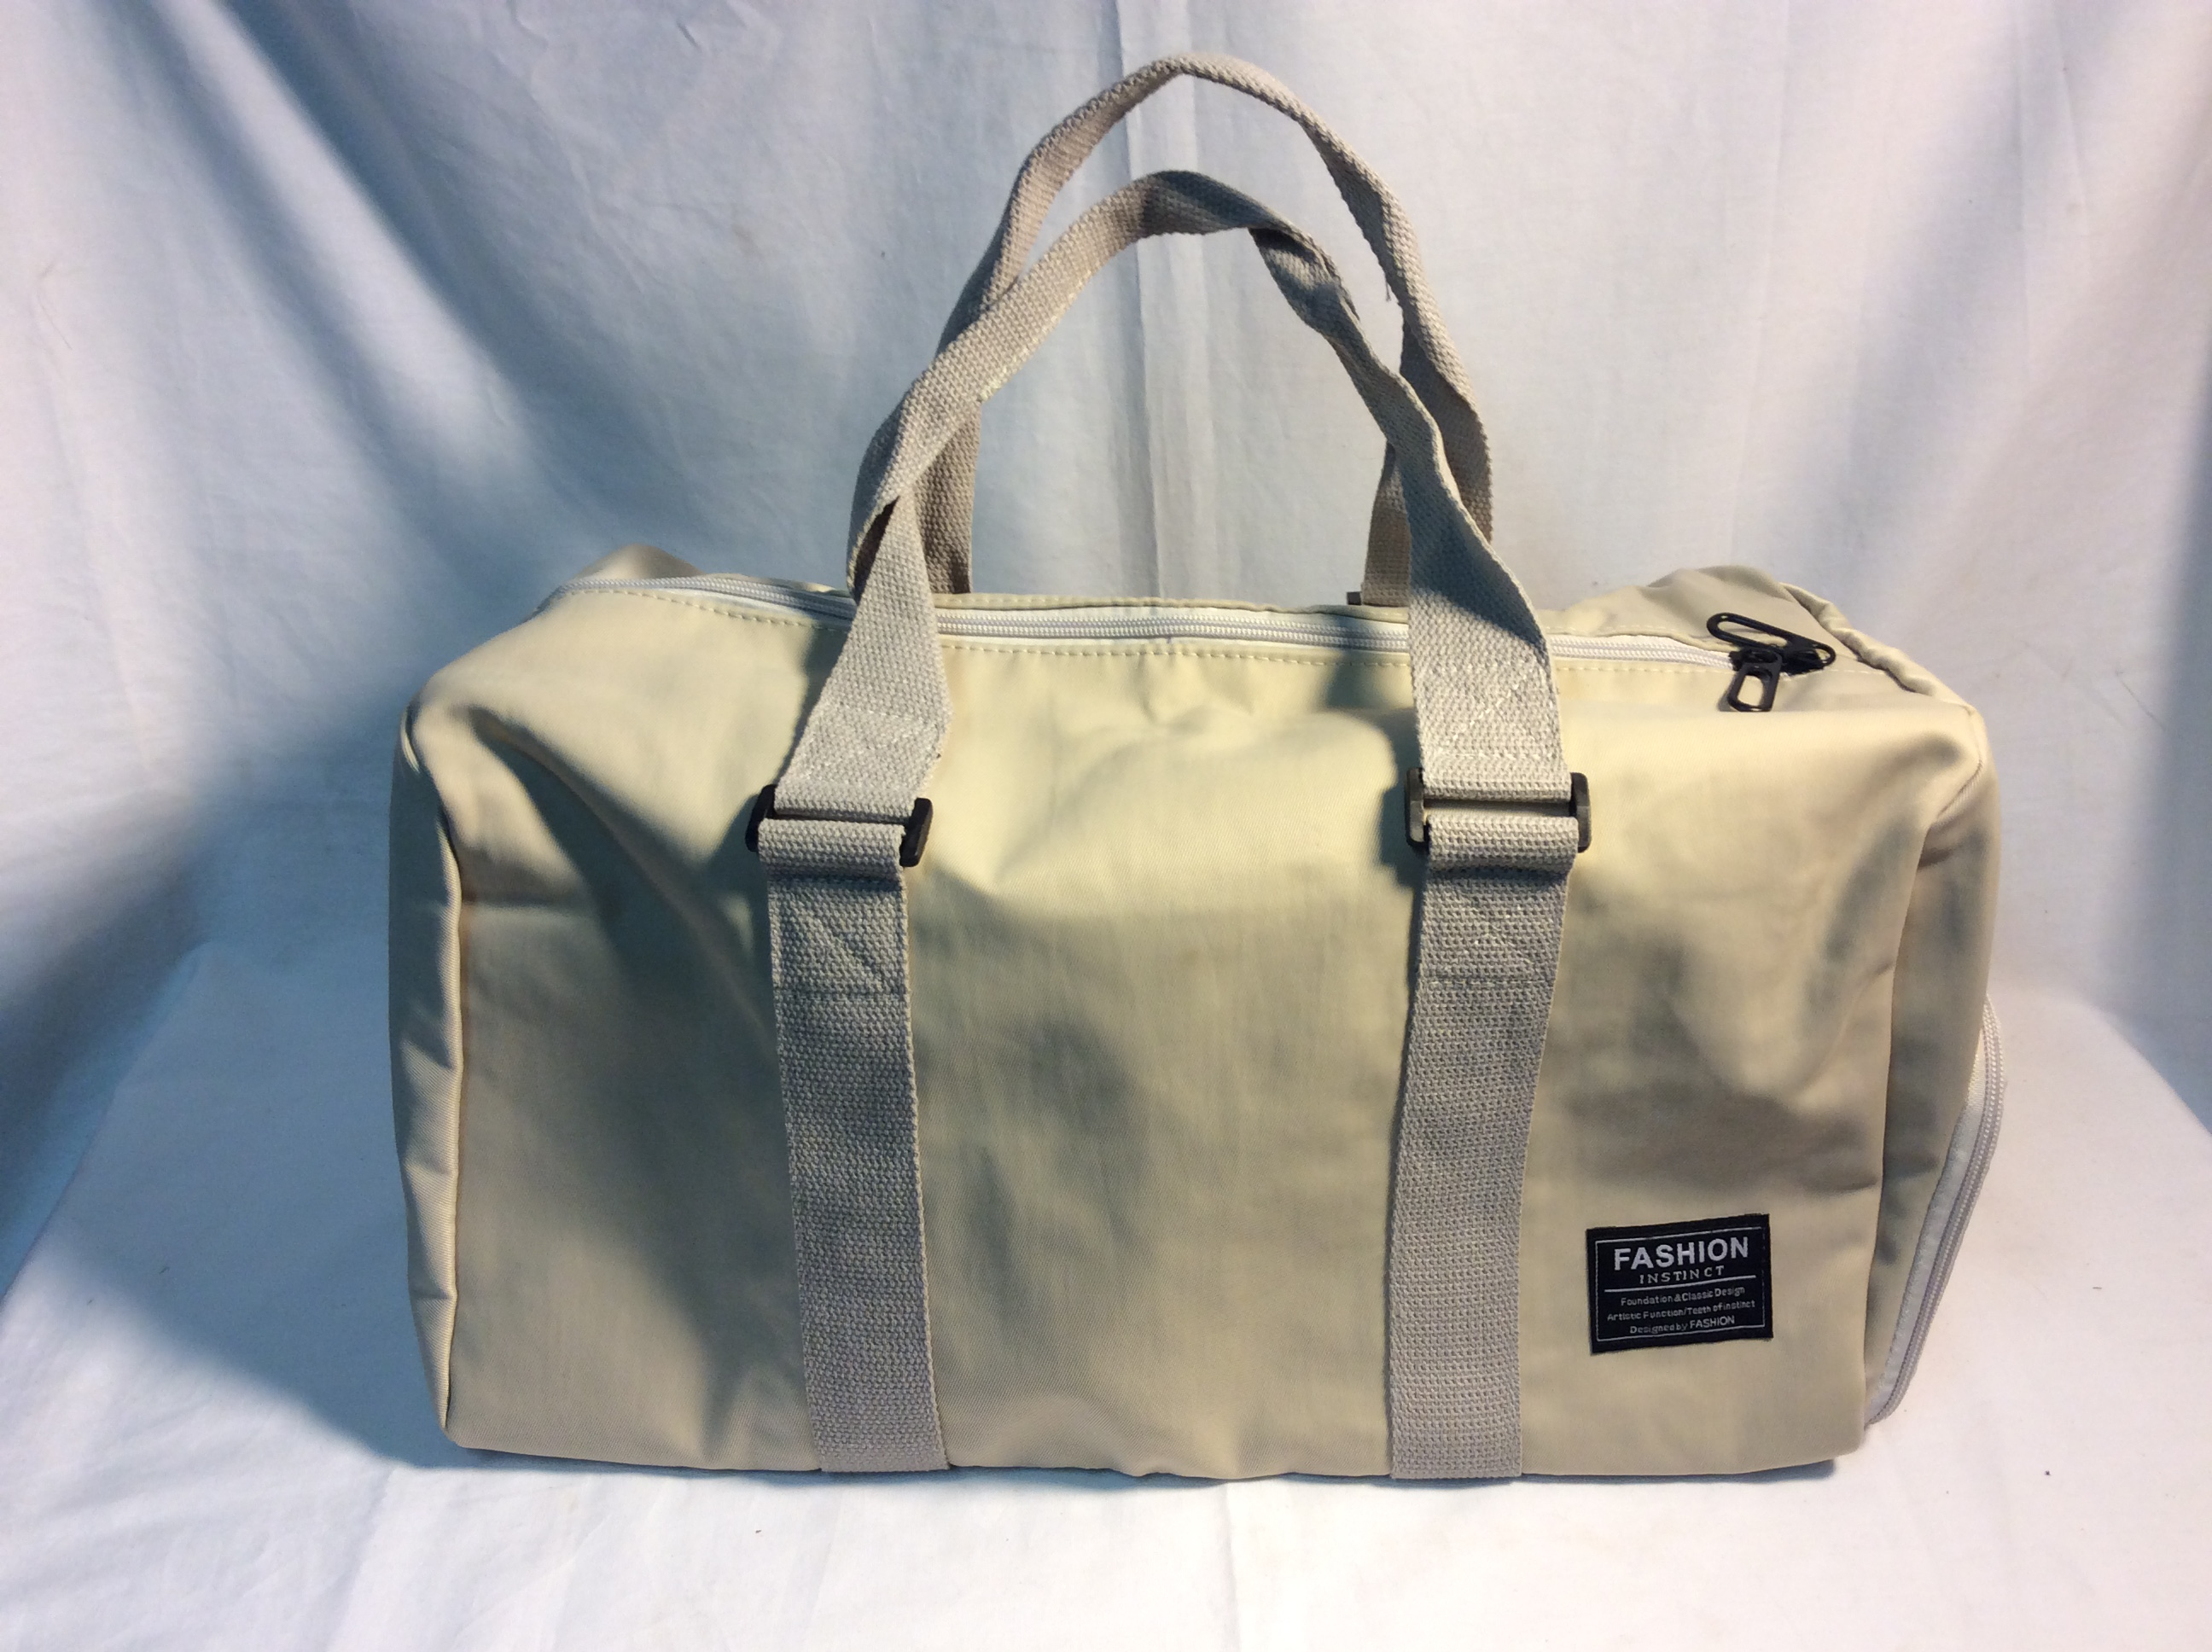 Cream Duffle bag, smaller size